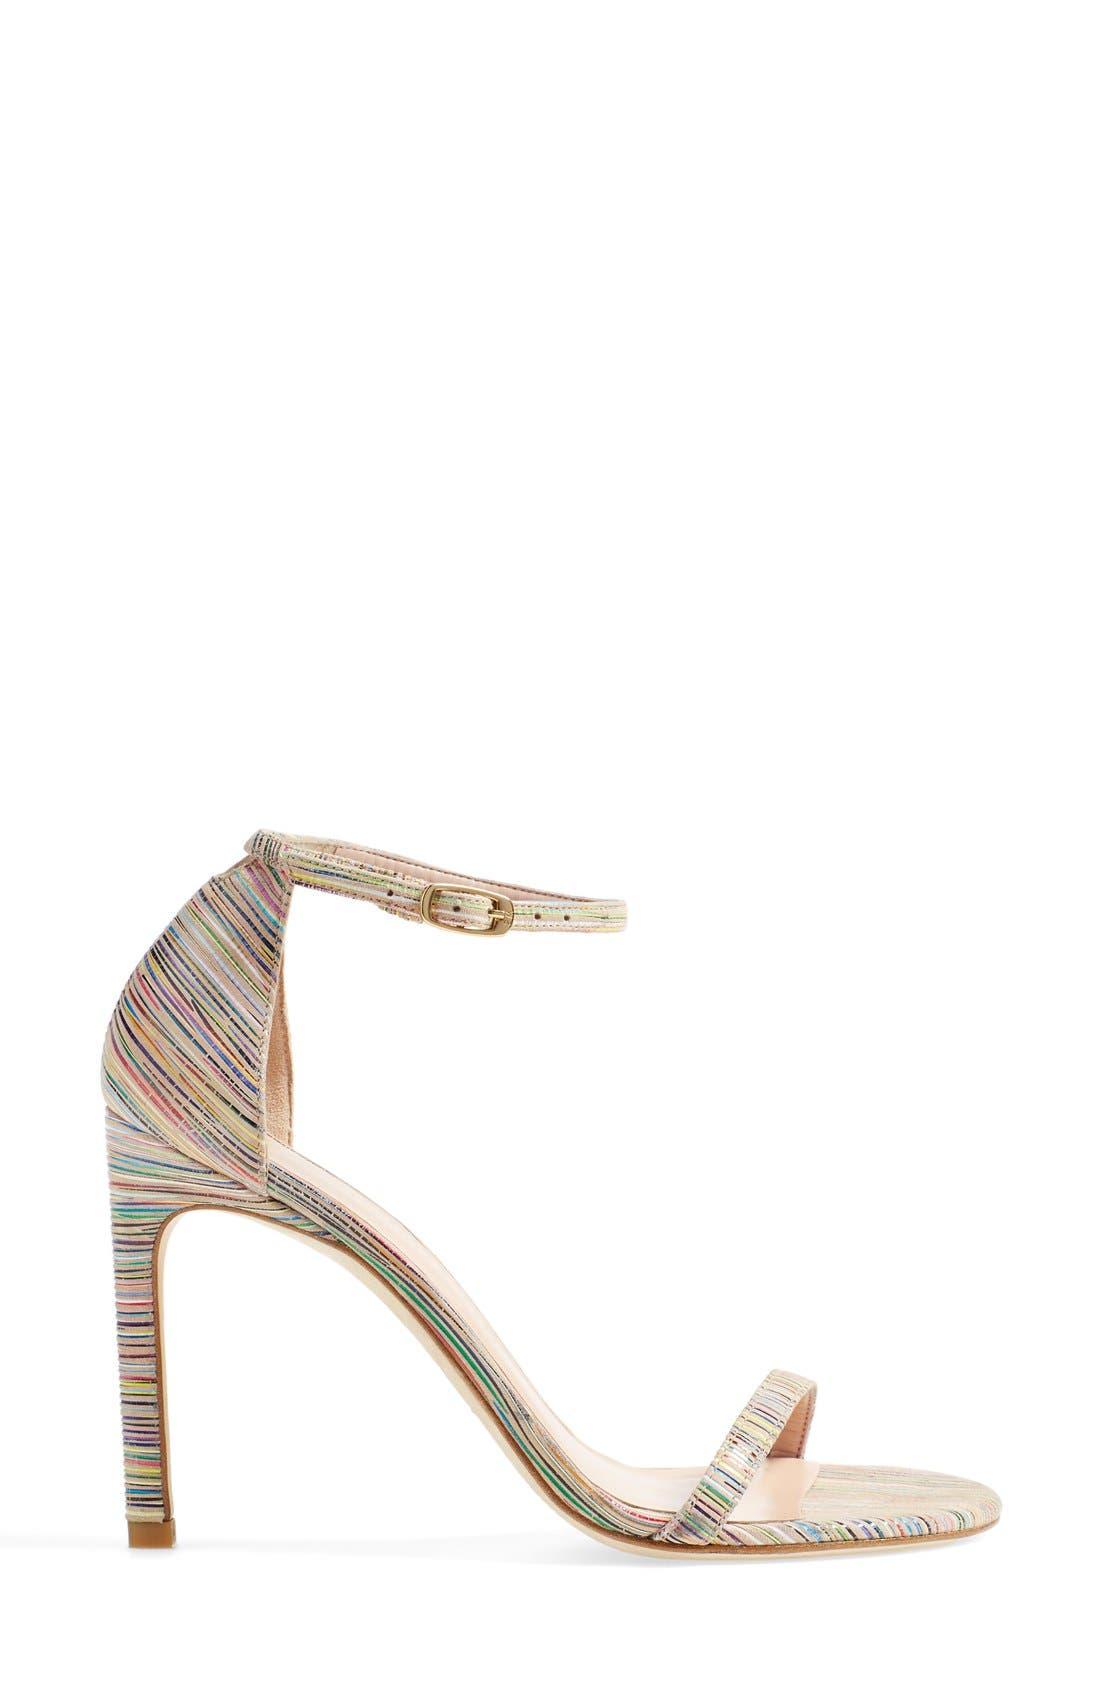 Nudistsong Ankle Strap Sandal,                             Alternate thumbnail 107, color,